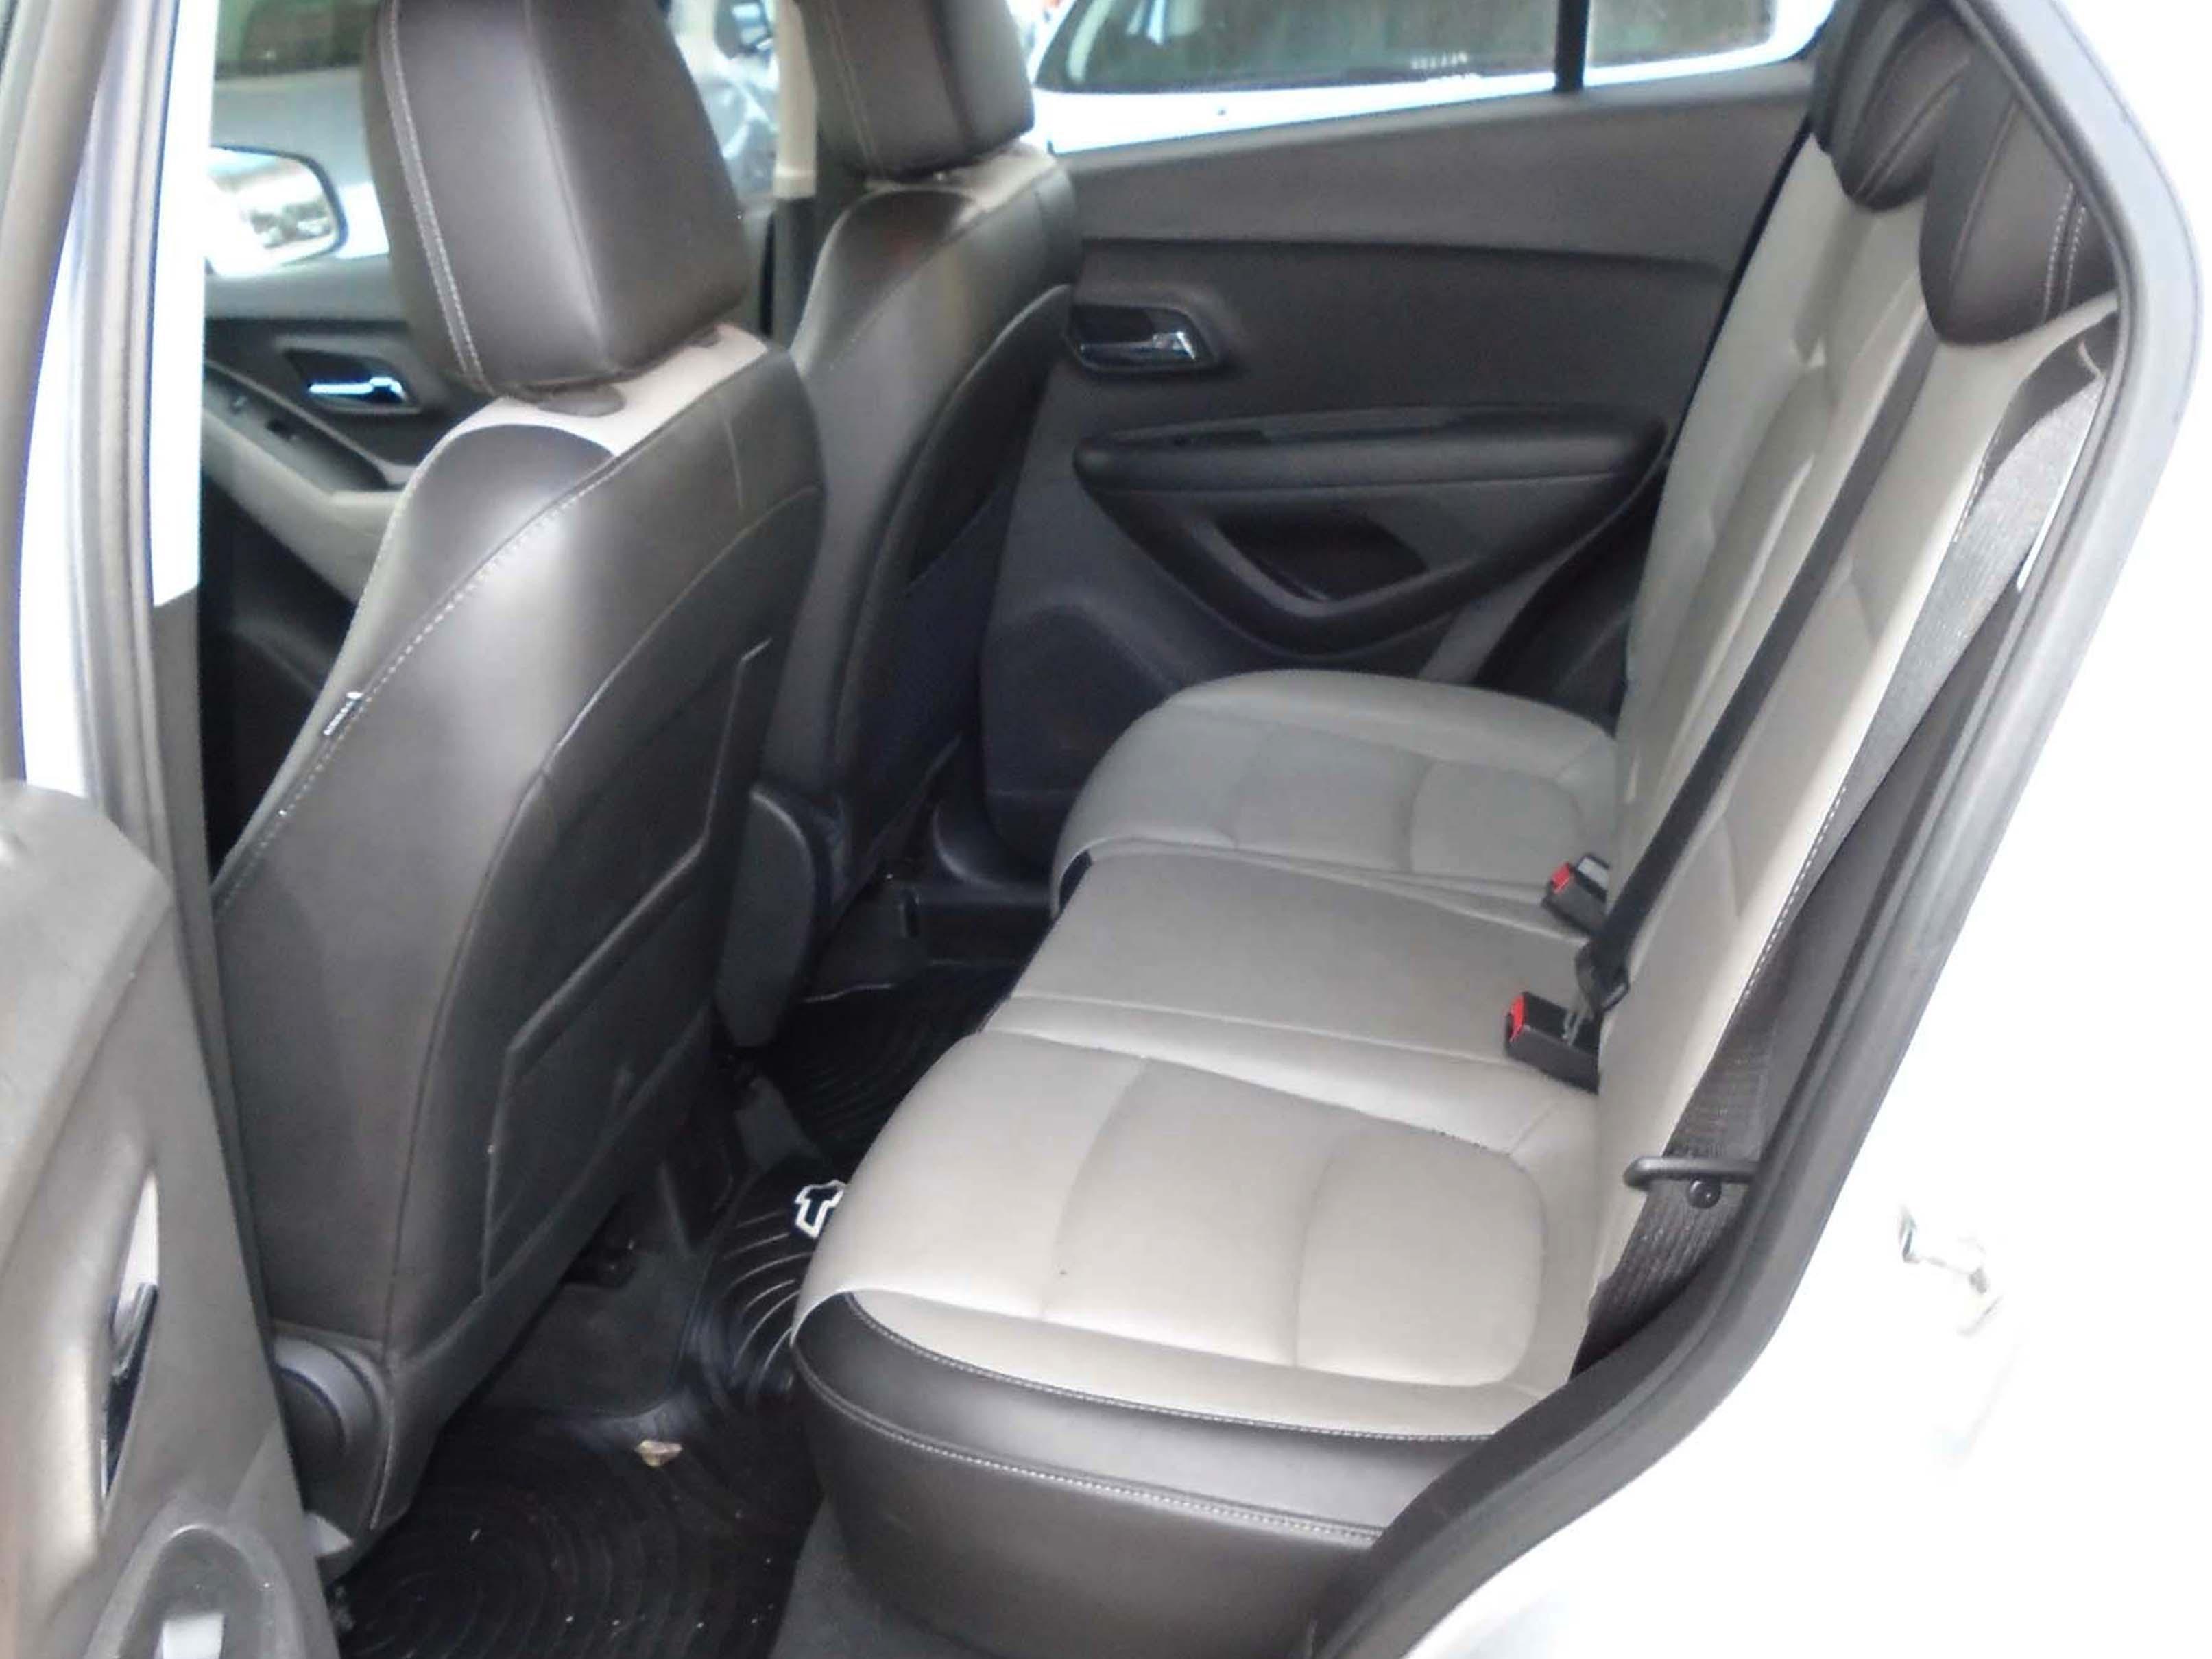 2016 CHEVROLET TRACKER AWD LTZ PLUS 1,8